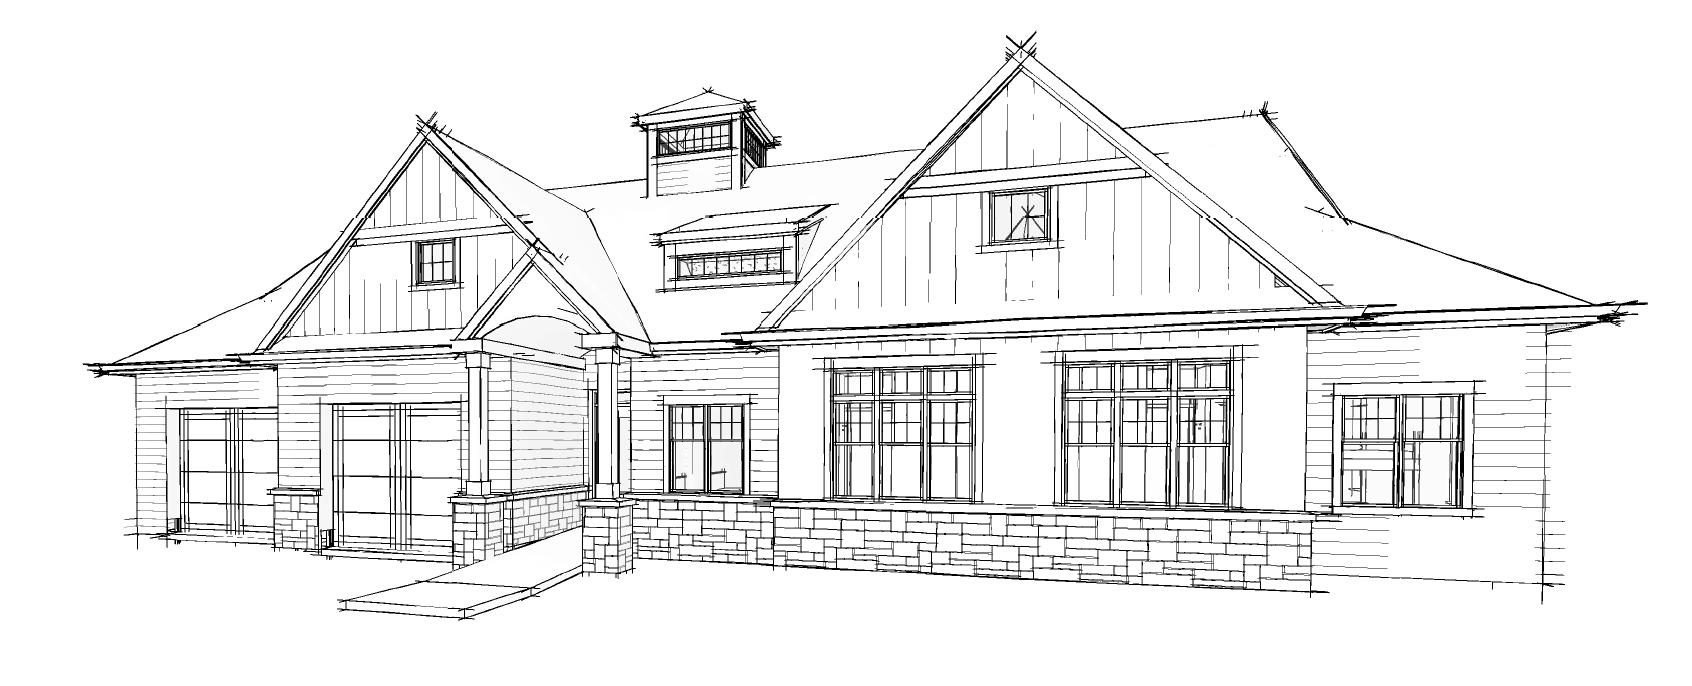 Hope-house-sketch-looking-north